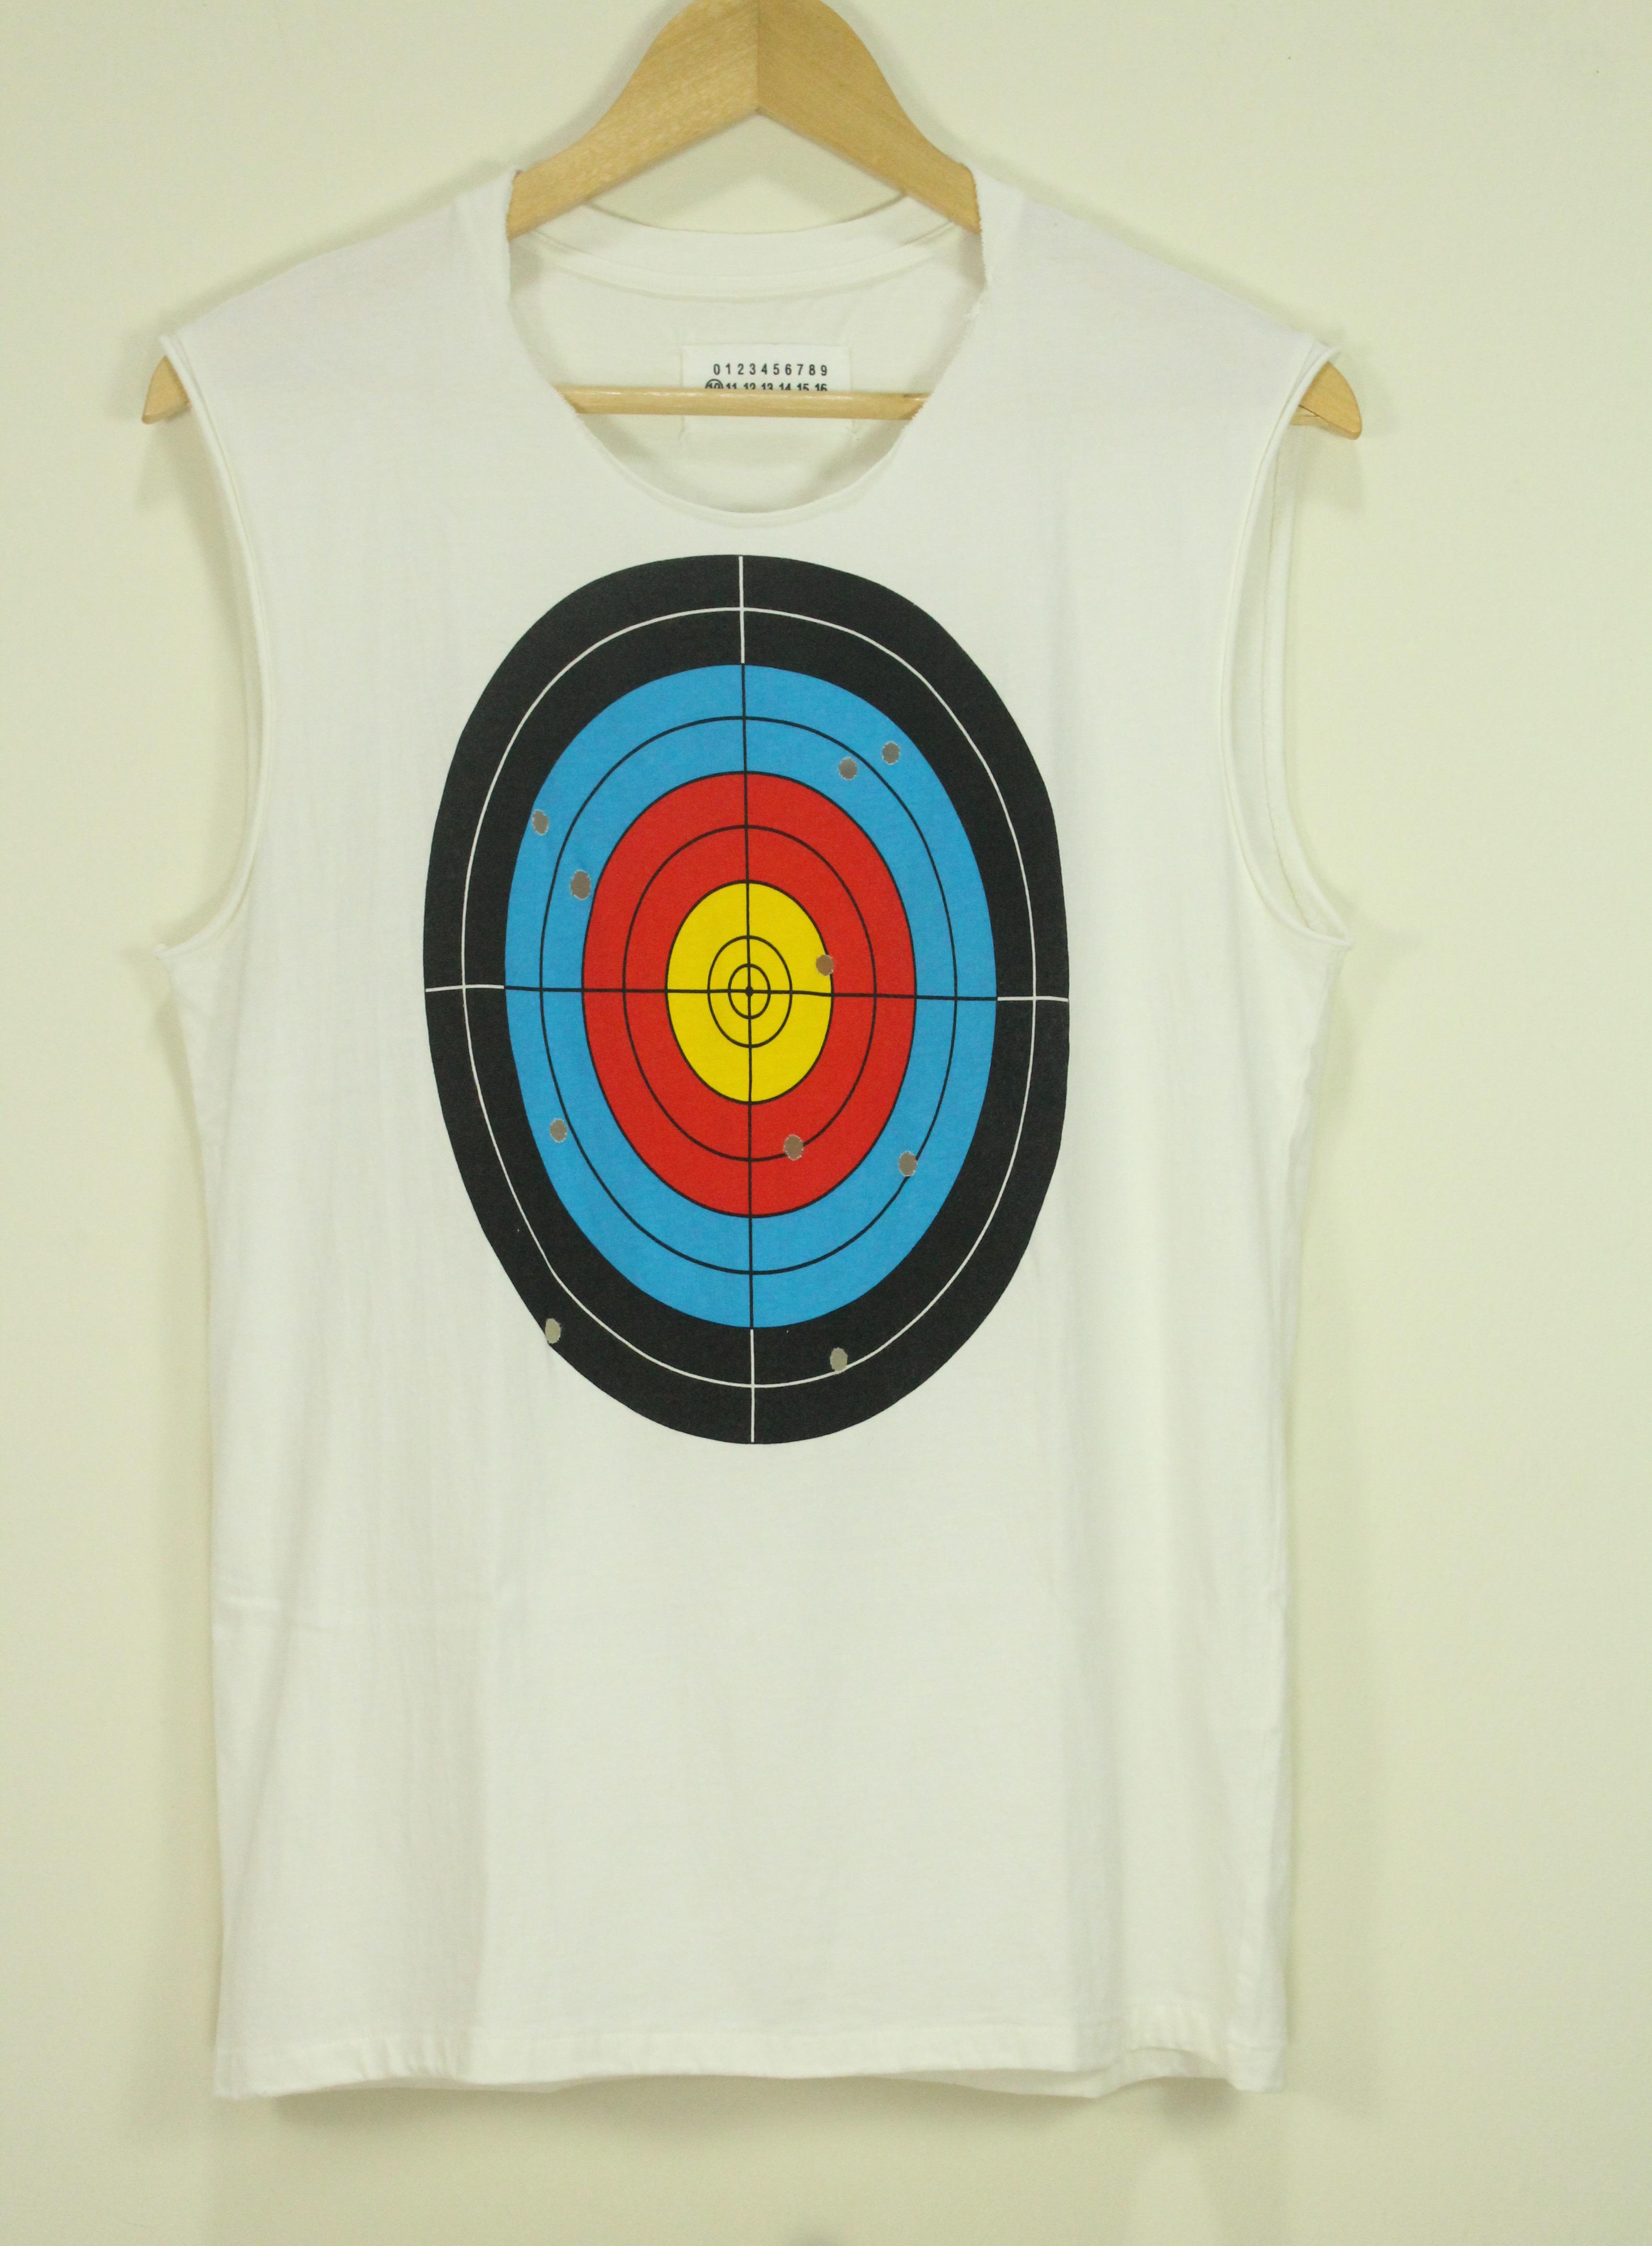 8c65bef794559f Maison Margiela T Shirt Sleeveless Tank Top Target Print Size s ...